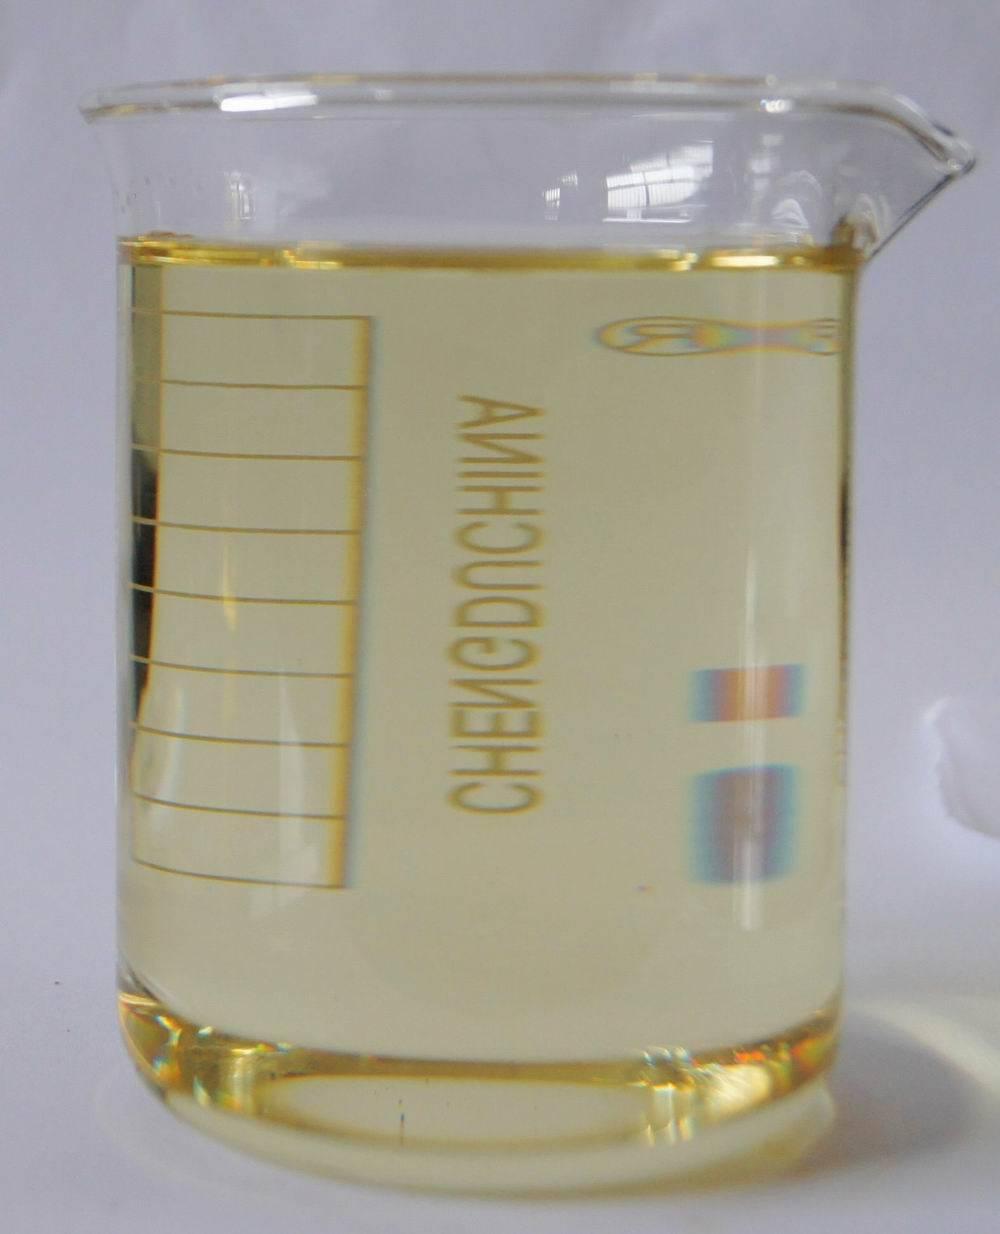 1-Methyl-2-pyrrolidineethanol (CAS 67004-64-2)